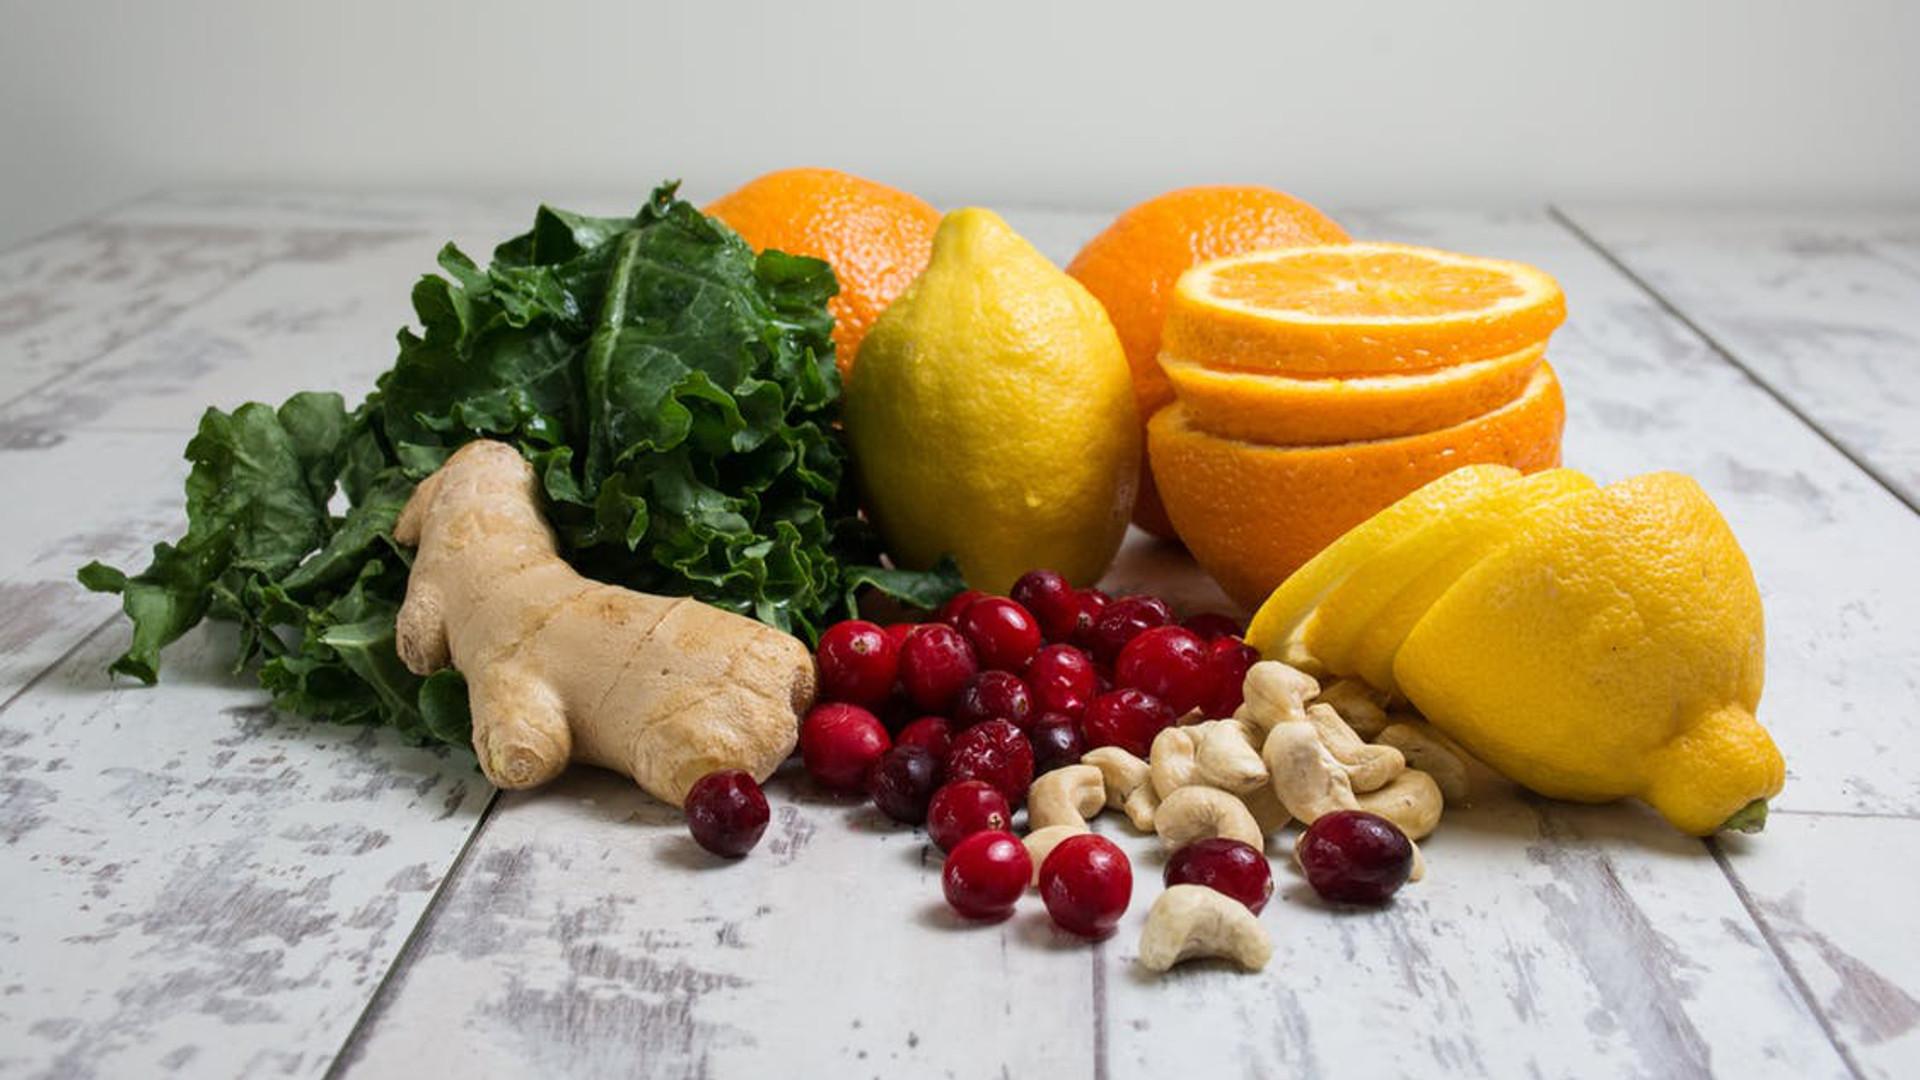 comer-frutas-y-verduras-para-vivir-mas-anos-1920